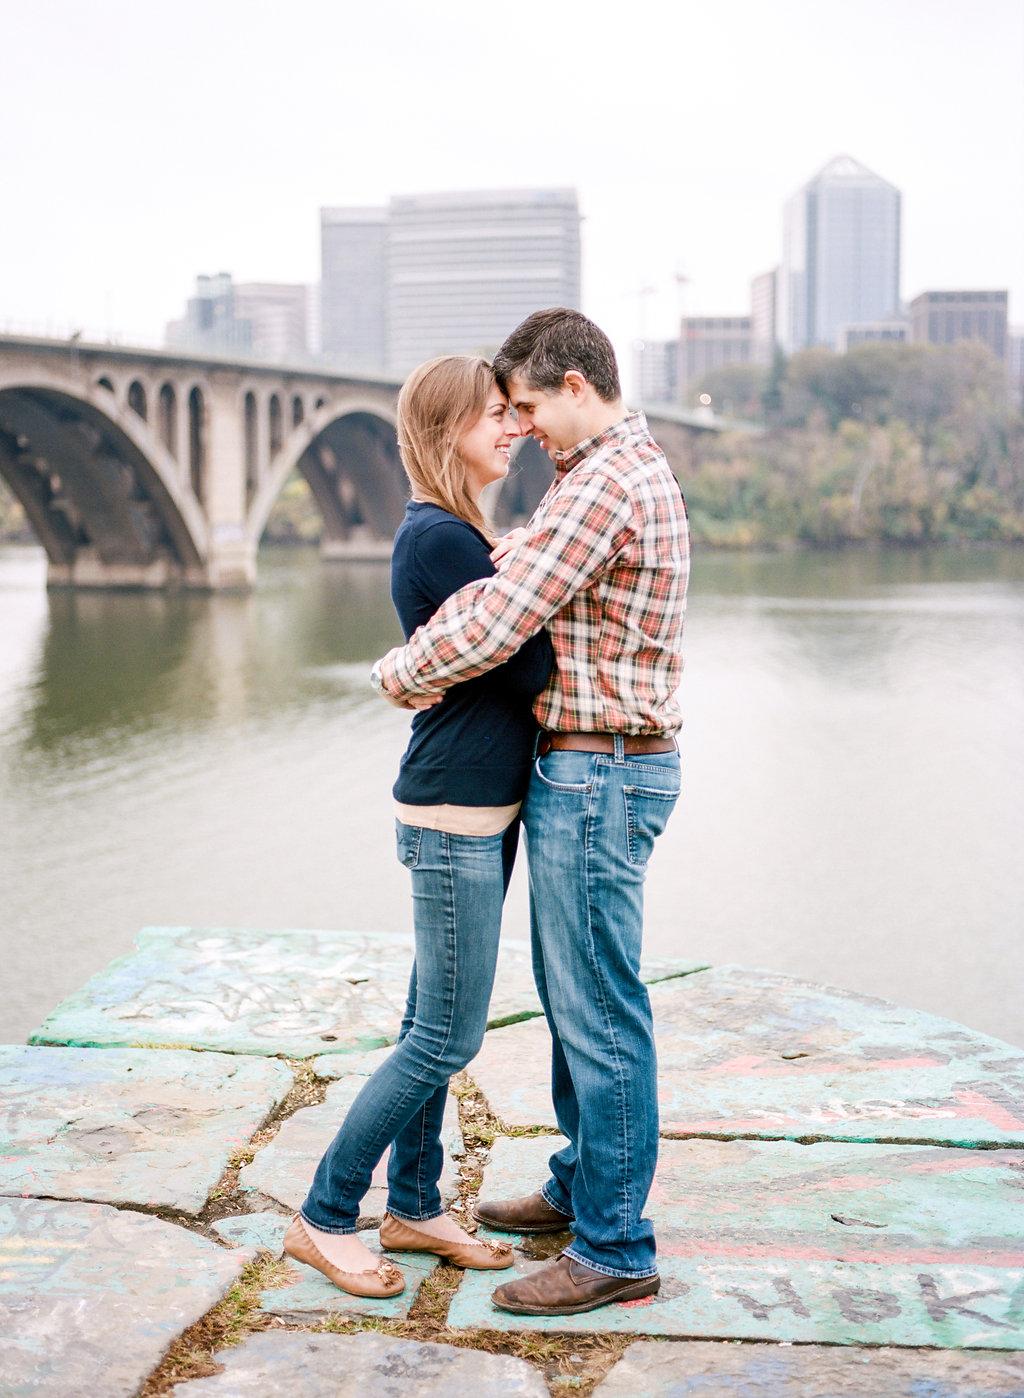 fall anniversary session in georgetown washington dc fine art photographer lissa ryan photography